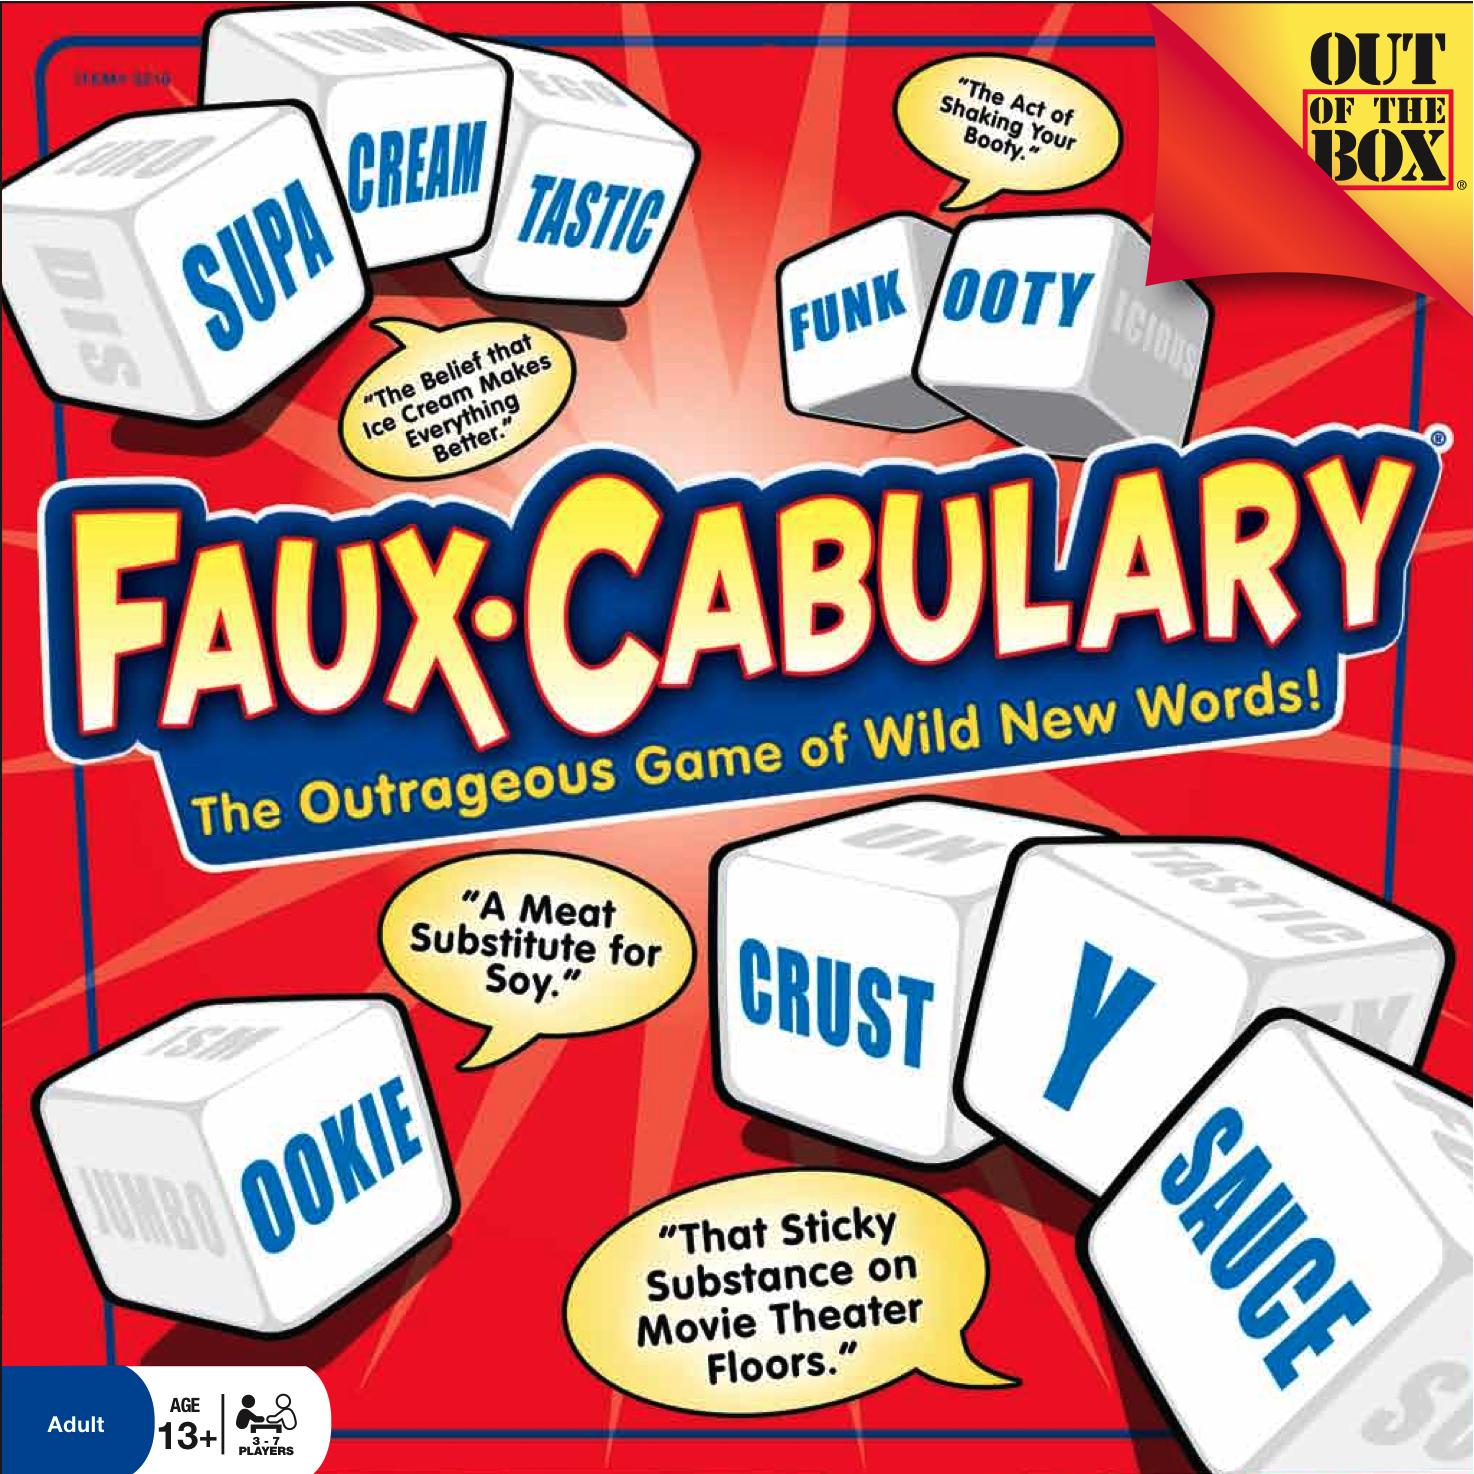 Faux-Cabulary